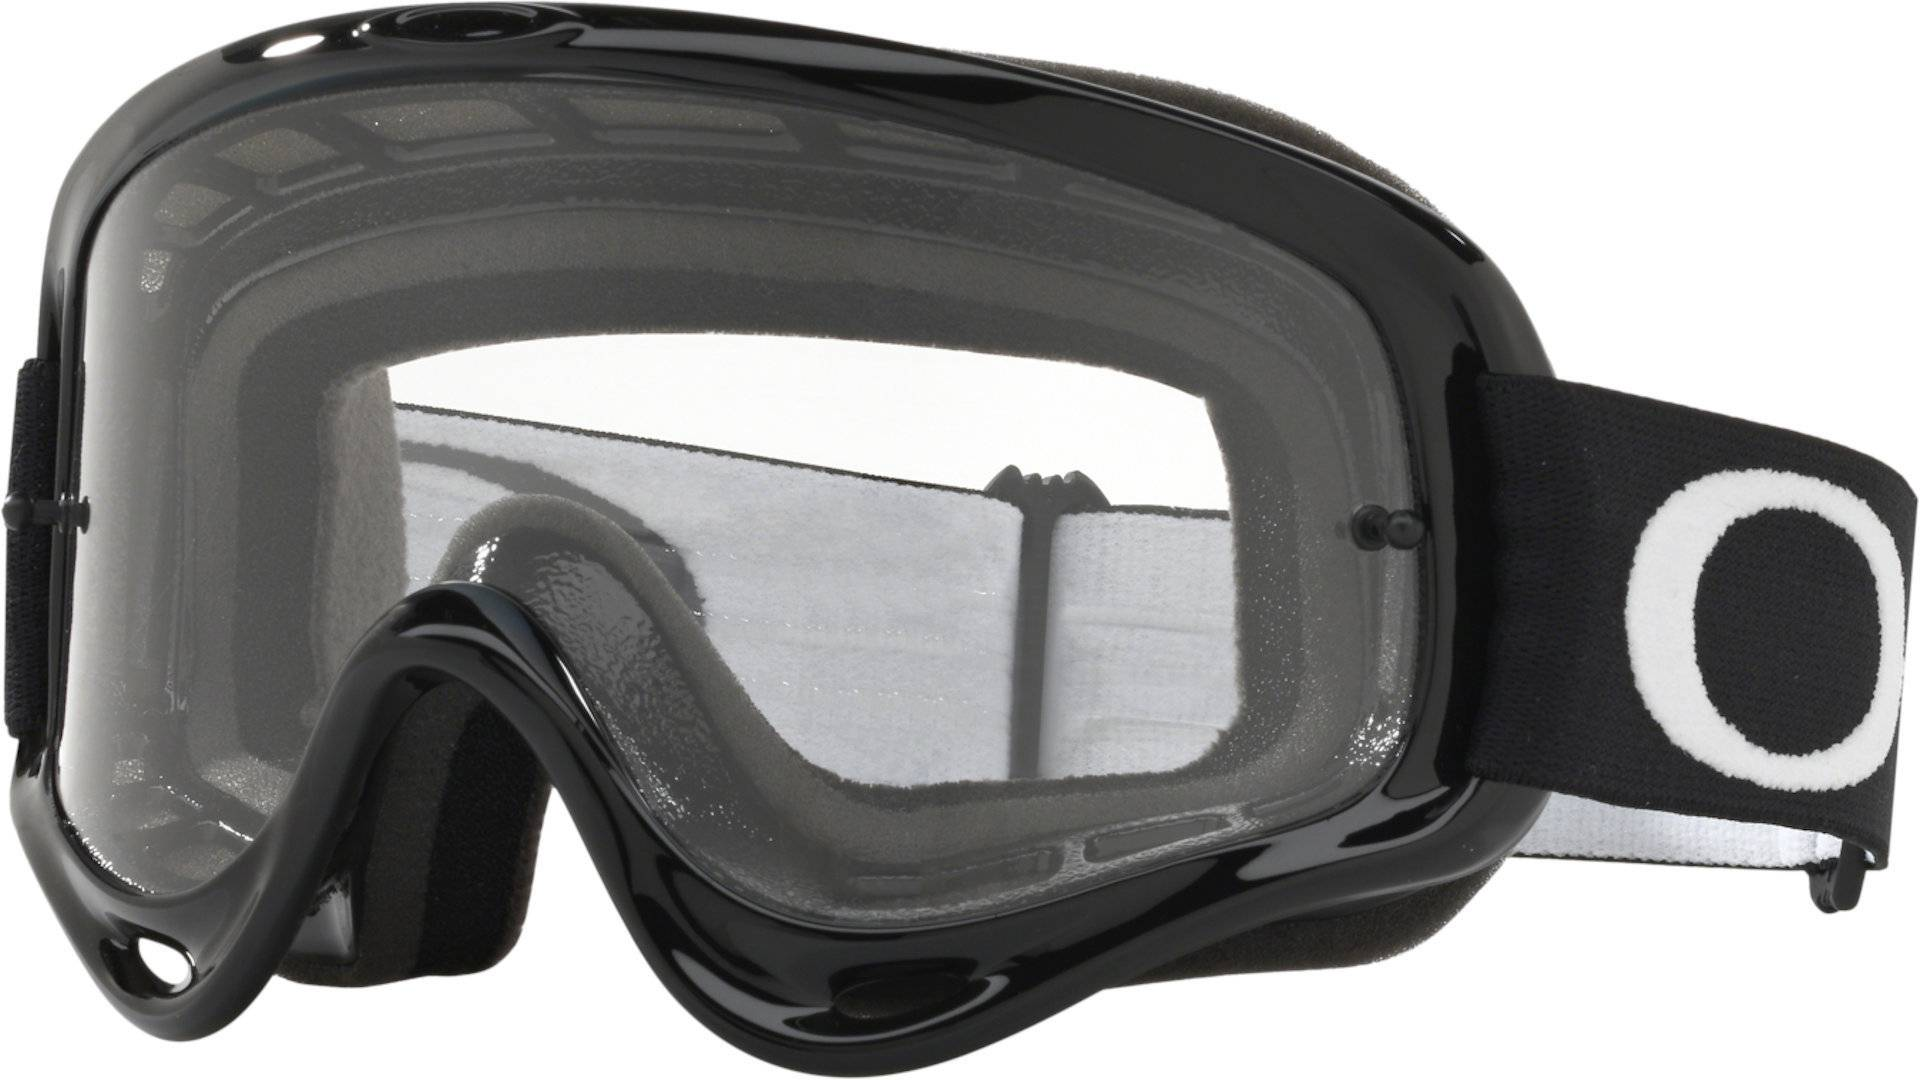 Oakley XS O-Frame Jet Black Occhiali Motocross